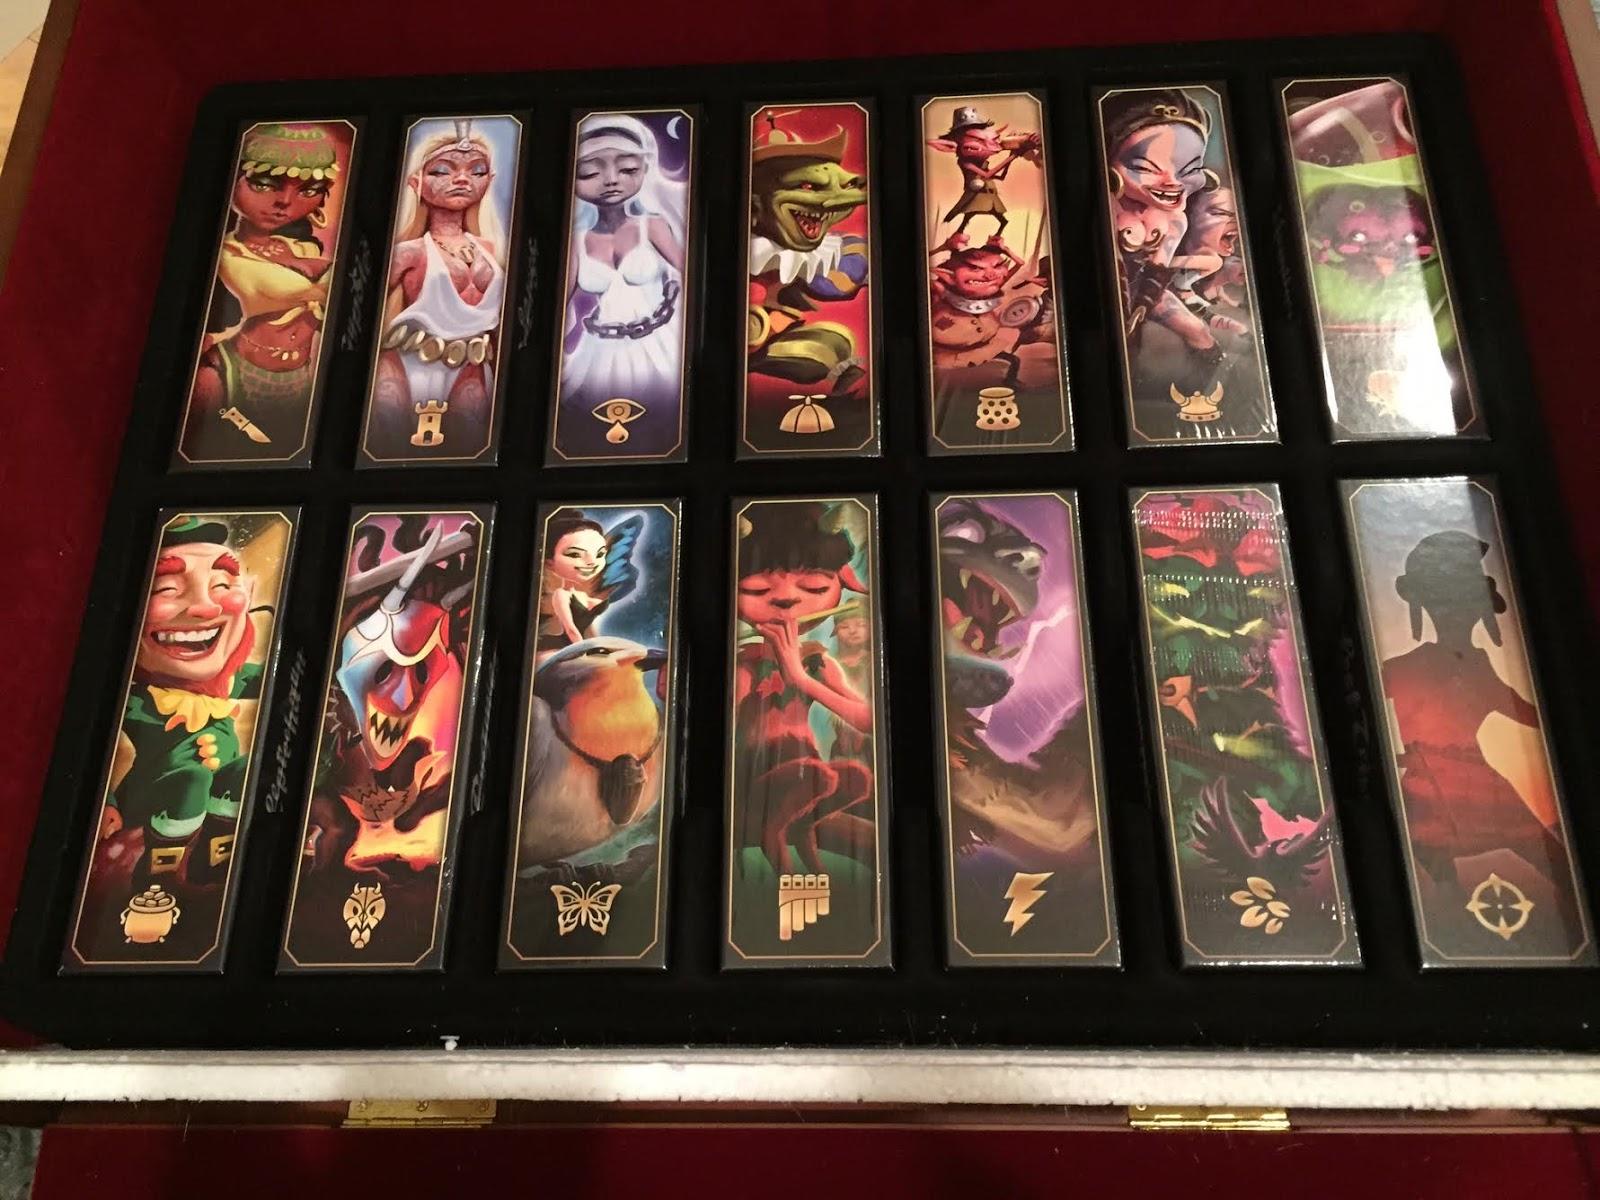 aethe的桌遊閒聊 | aethe's board games